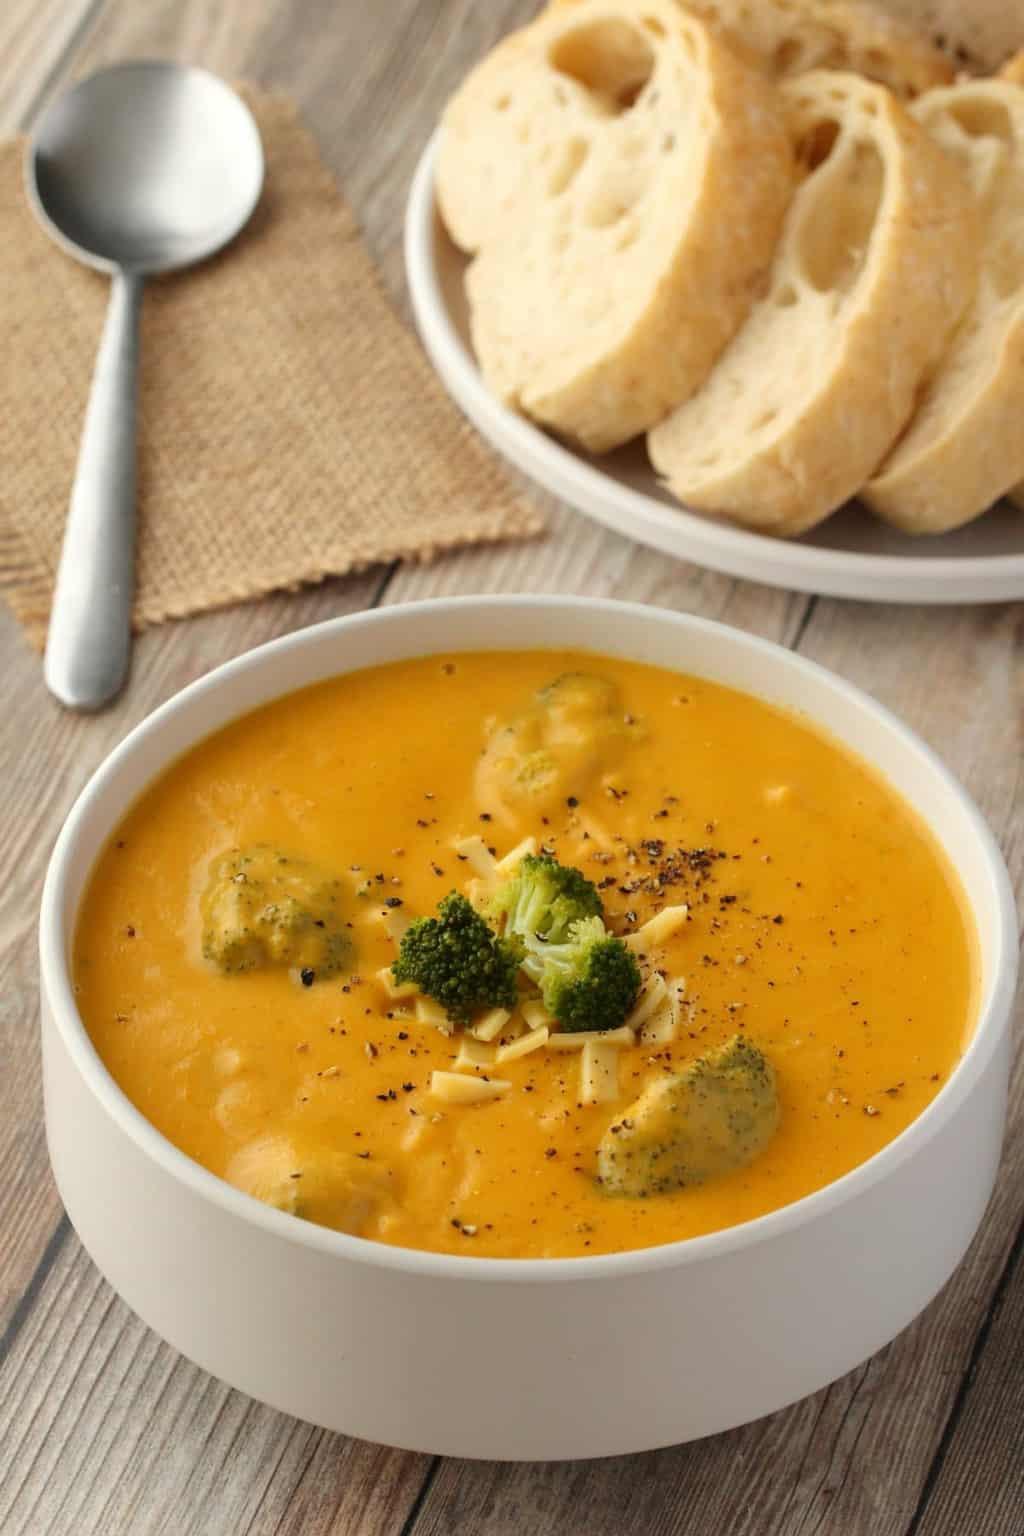 Vegan Broccoli Cheddar Soup  Vegan Broccoli Cheese Soup Rich and Cheesy Loving It